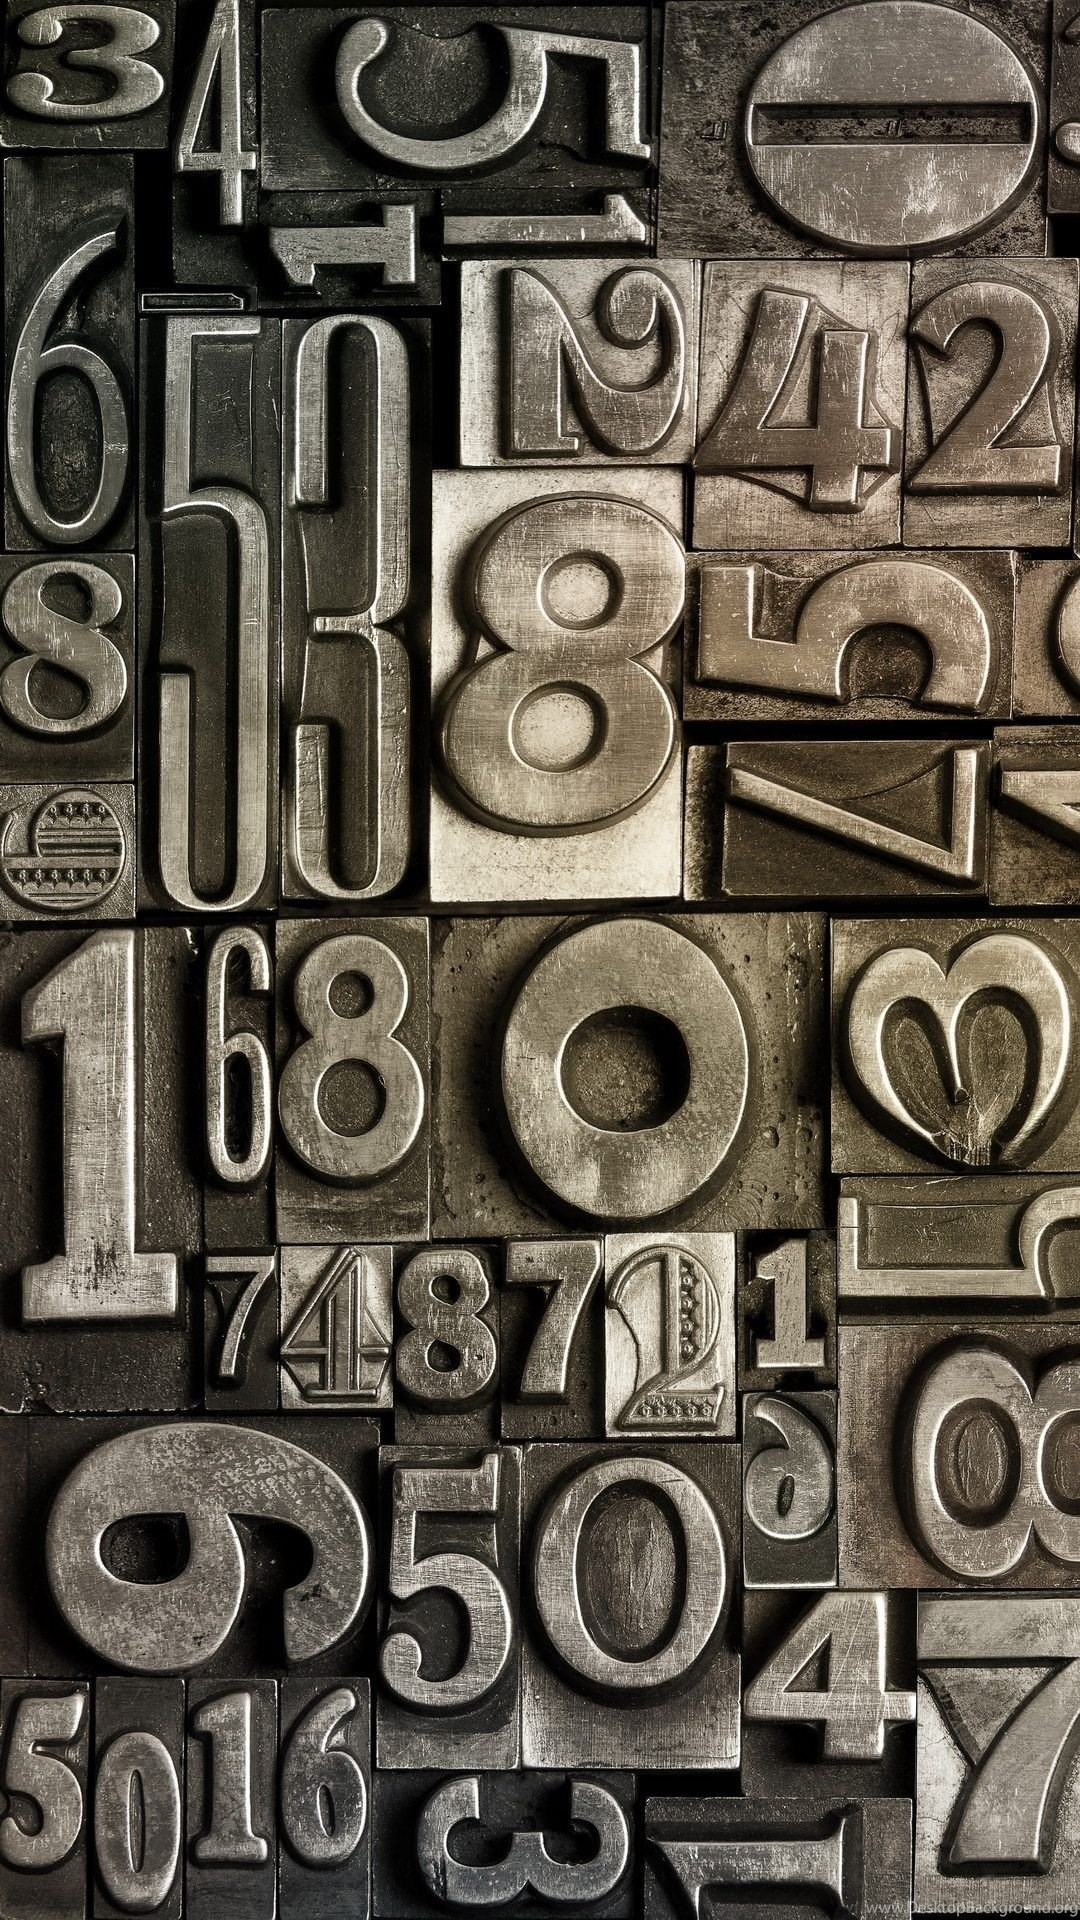 Designs metallic numbers iphone 6 plus wallpapers abstract - Number wallpaper ...